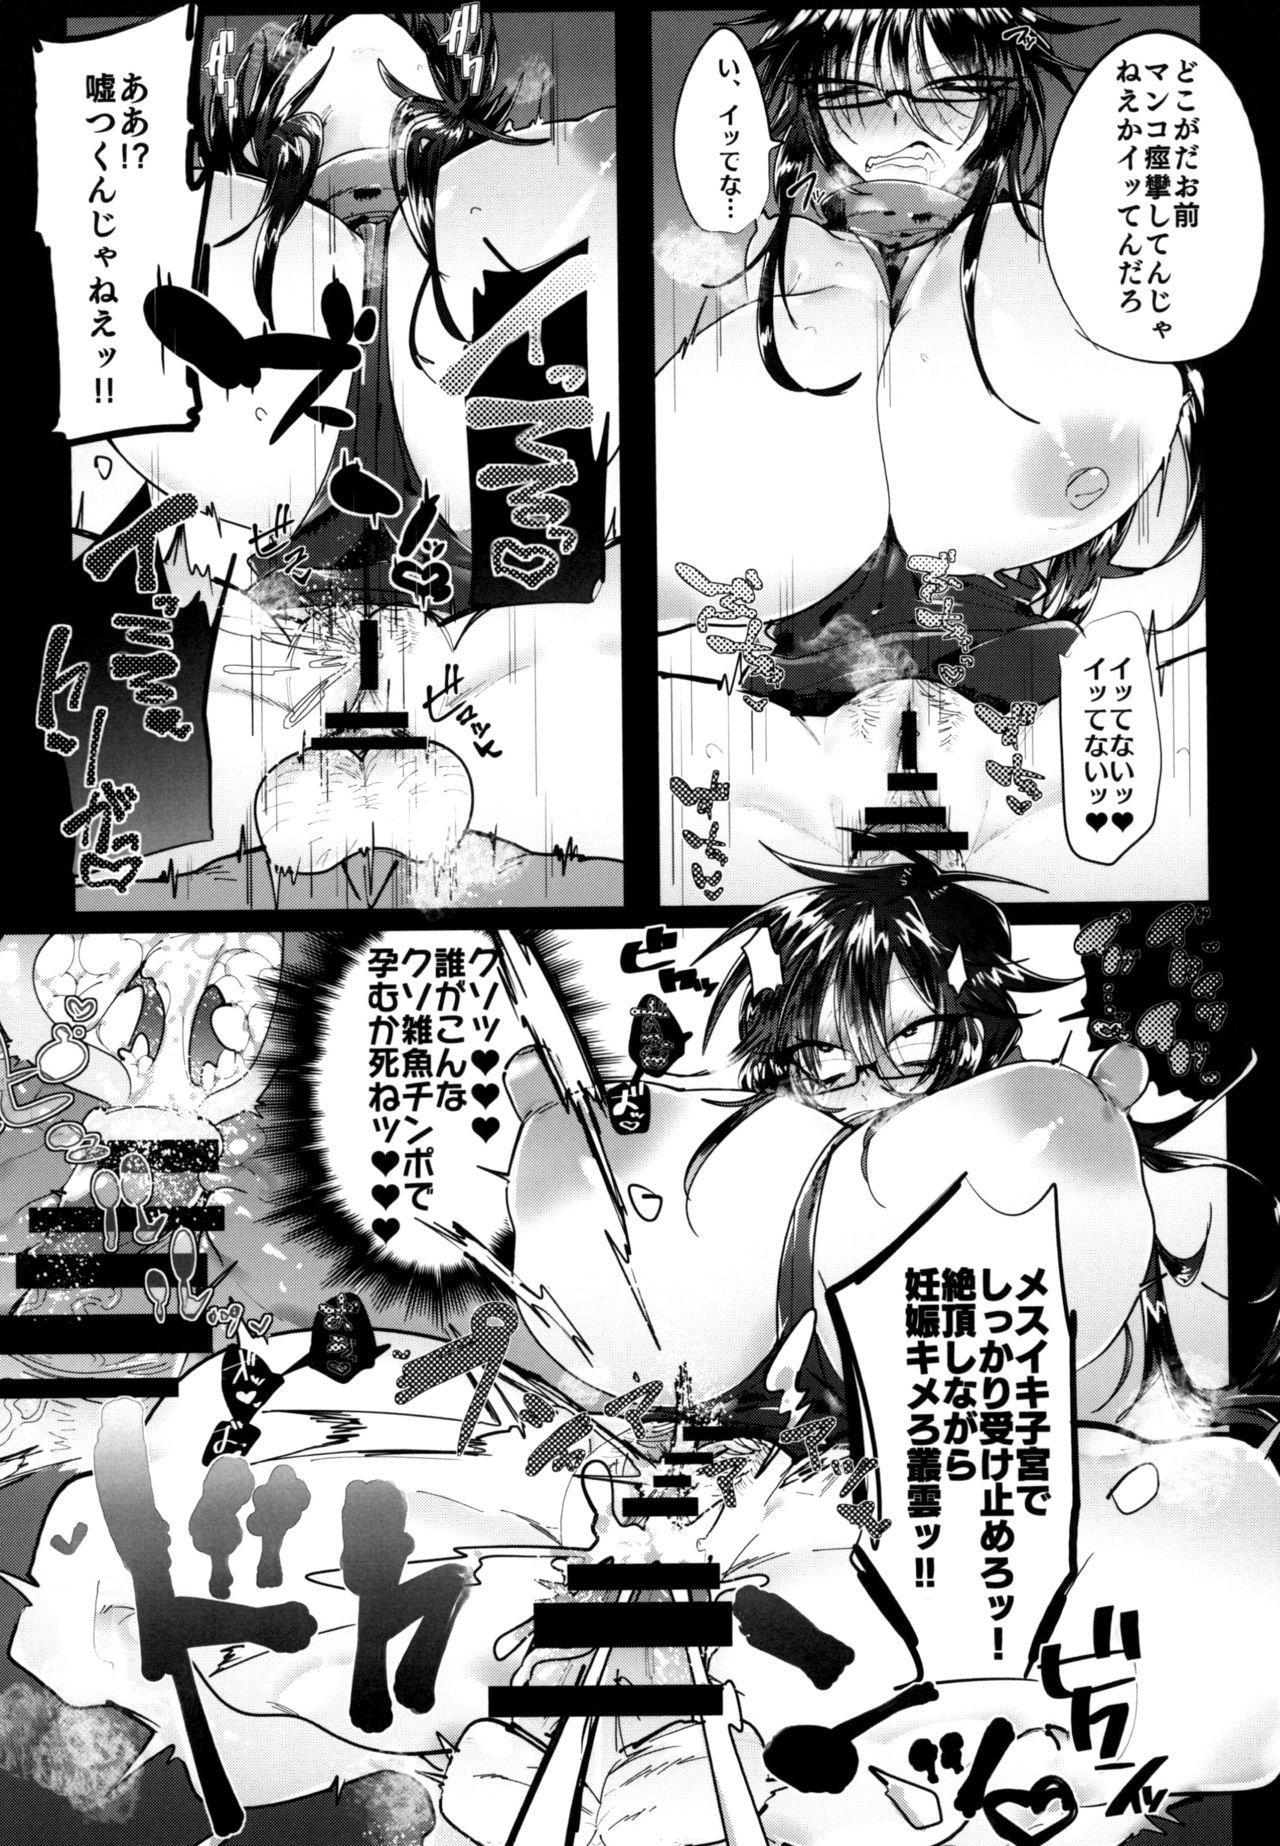 Kurokami Sanpakugan Megane Danshi TS Kyousei Fukujuu Fuck 20